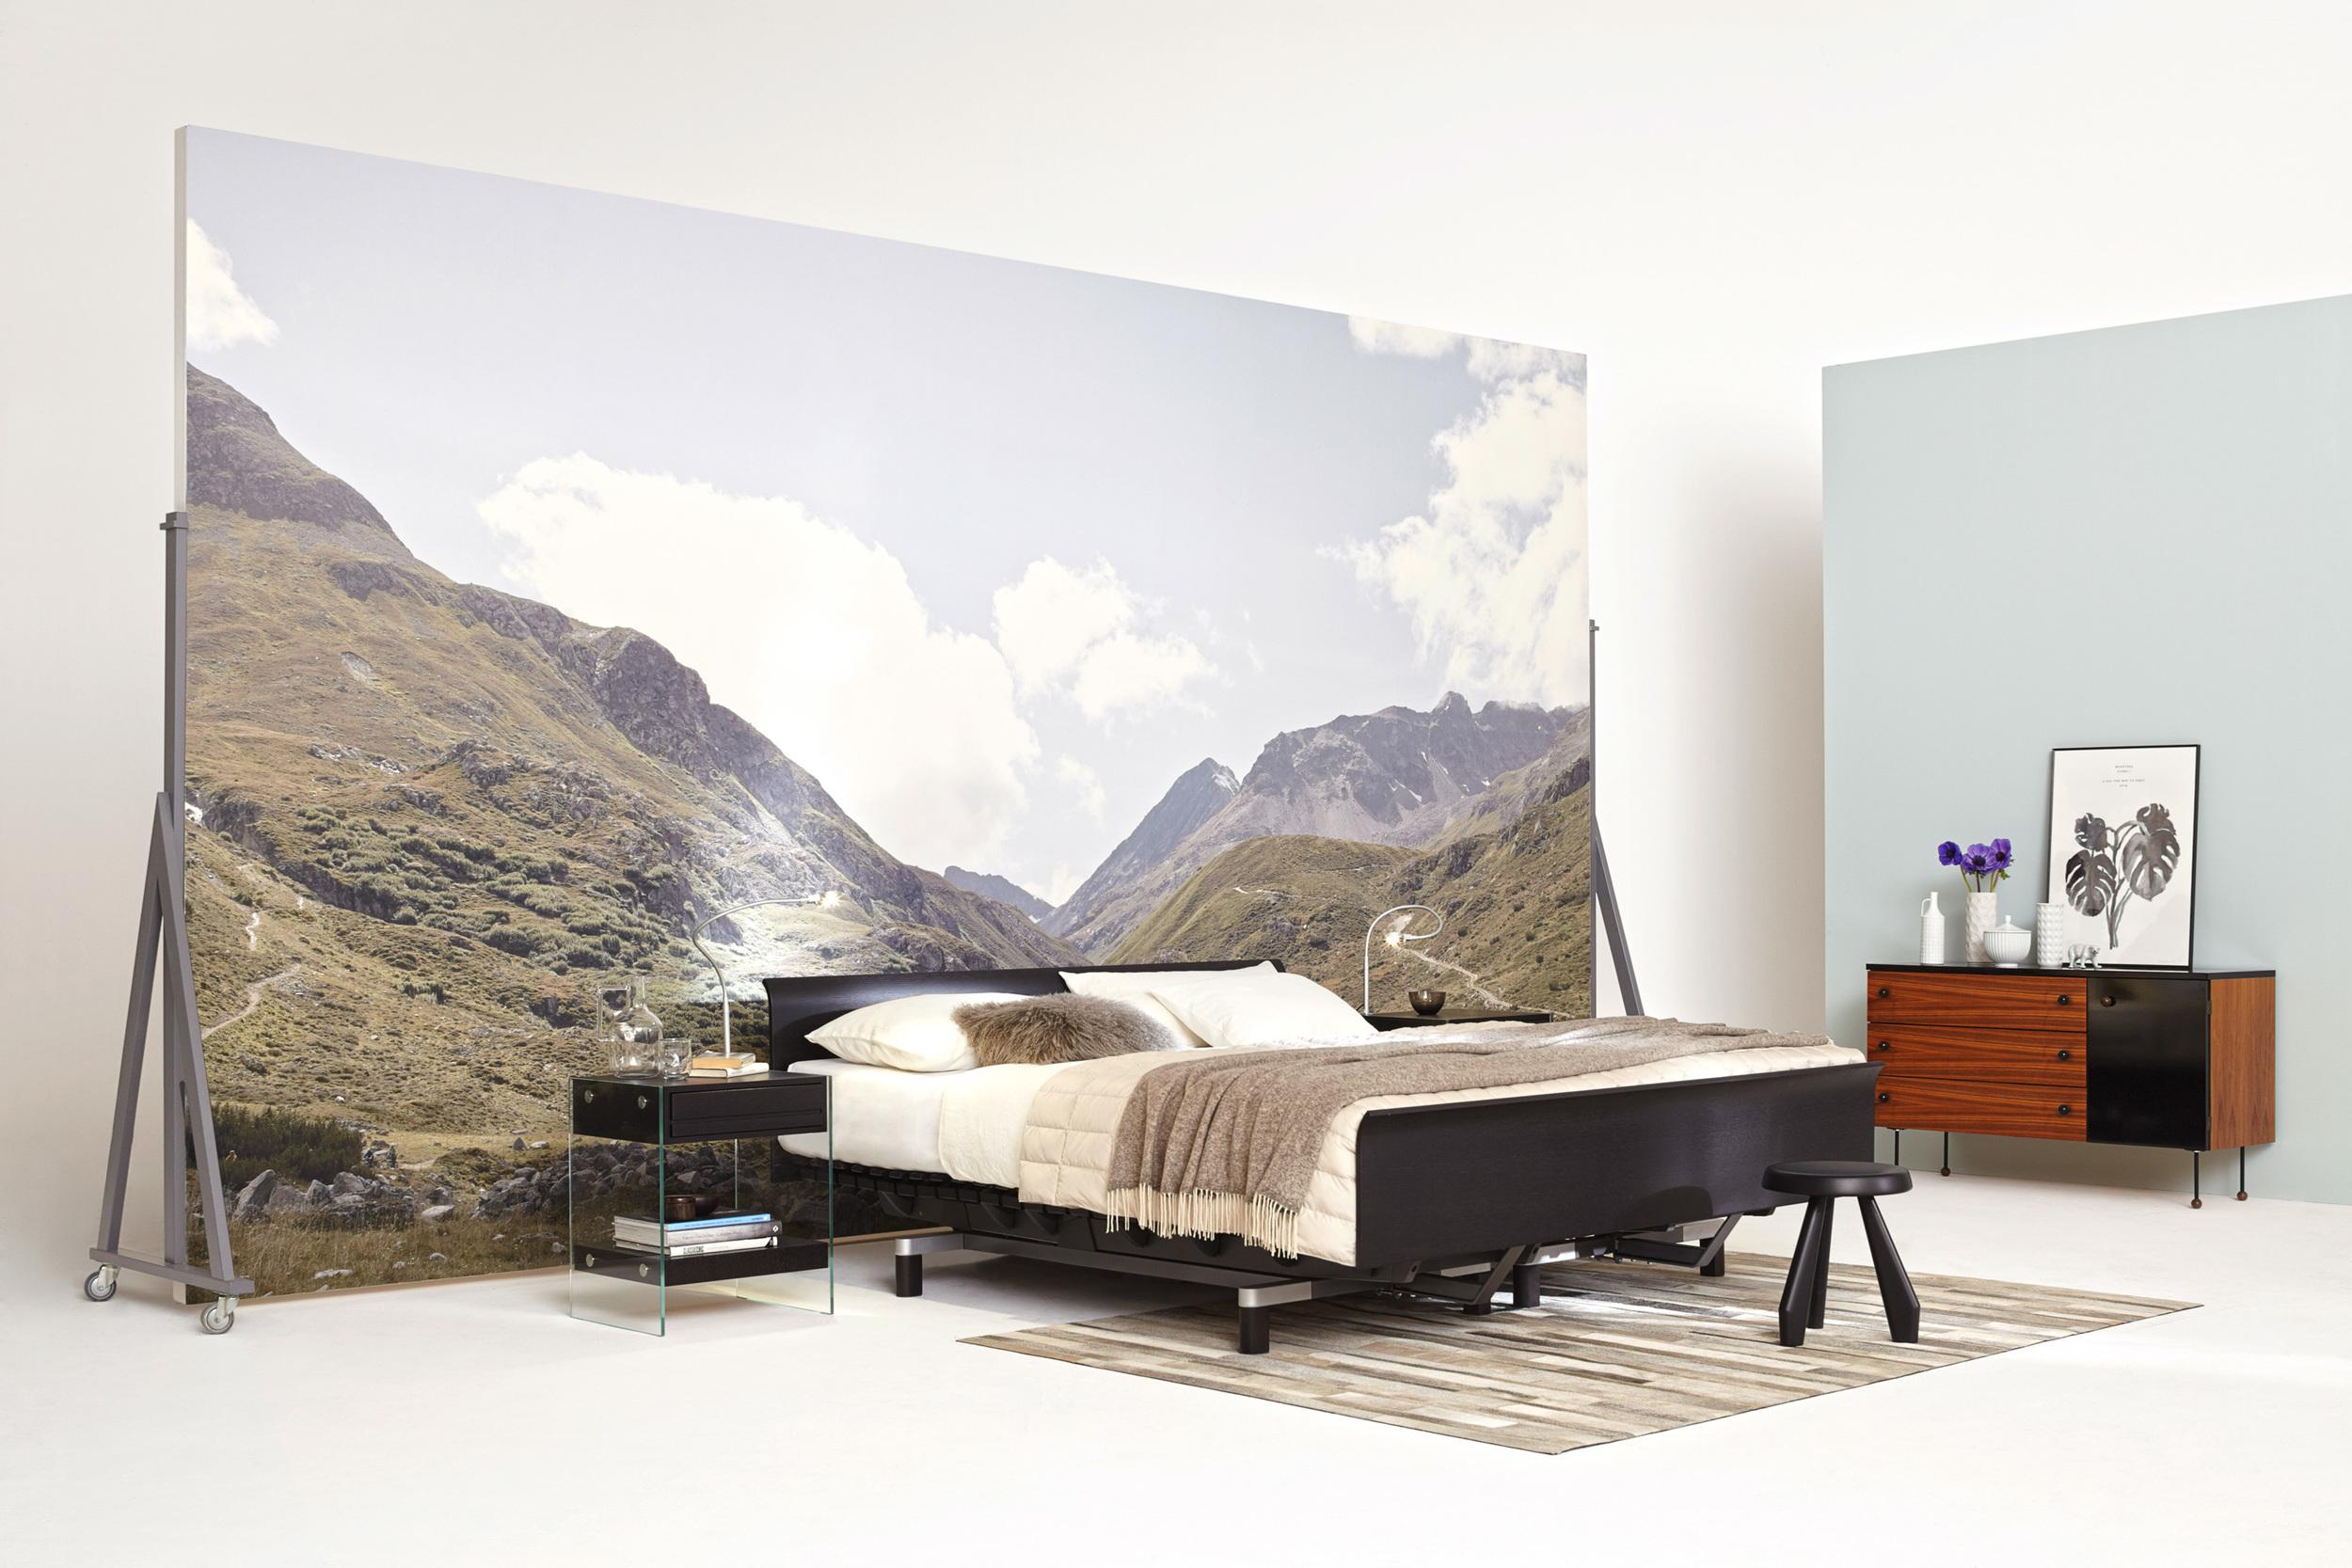 Swissflex swissbed lounge